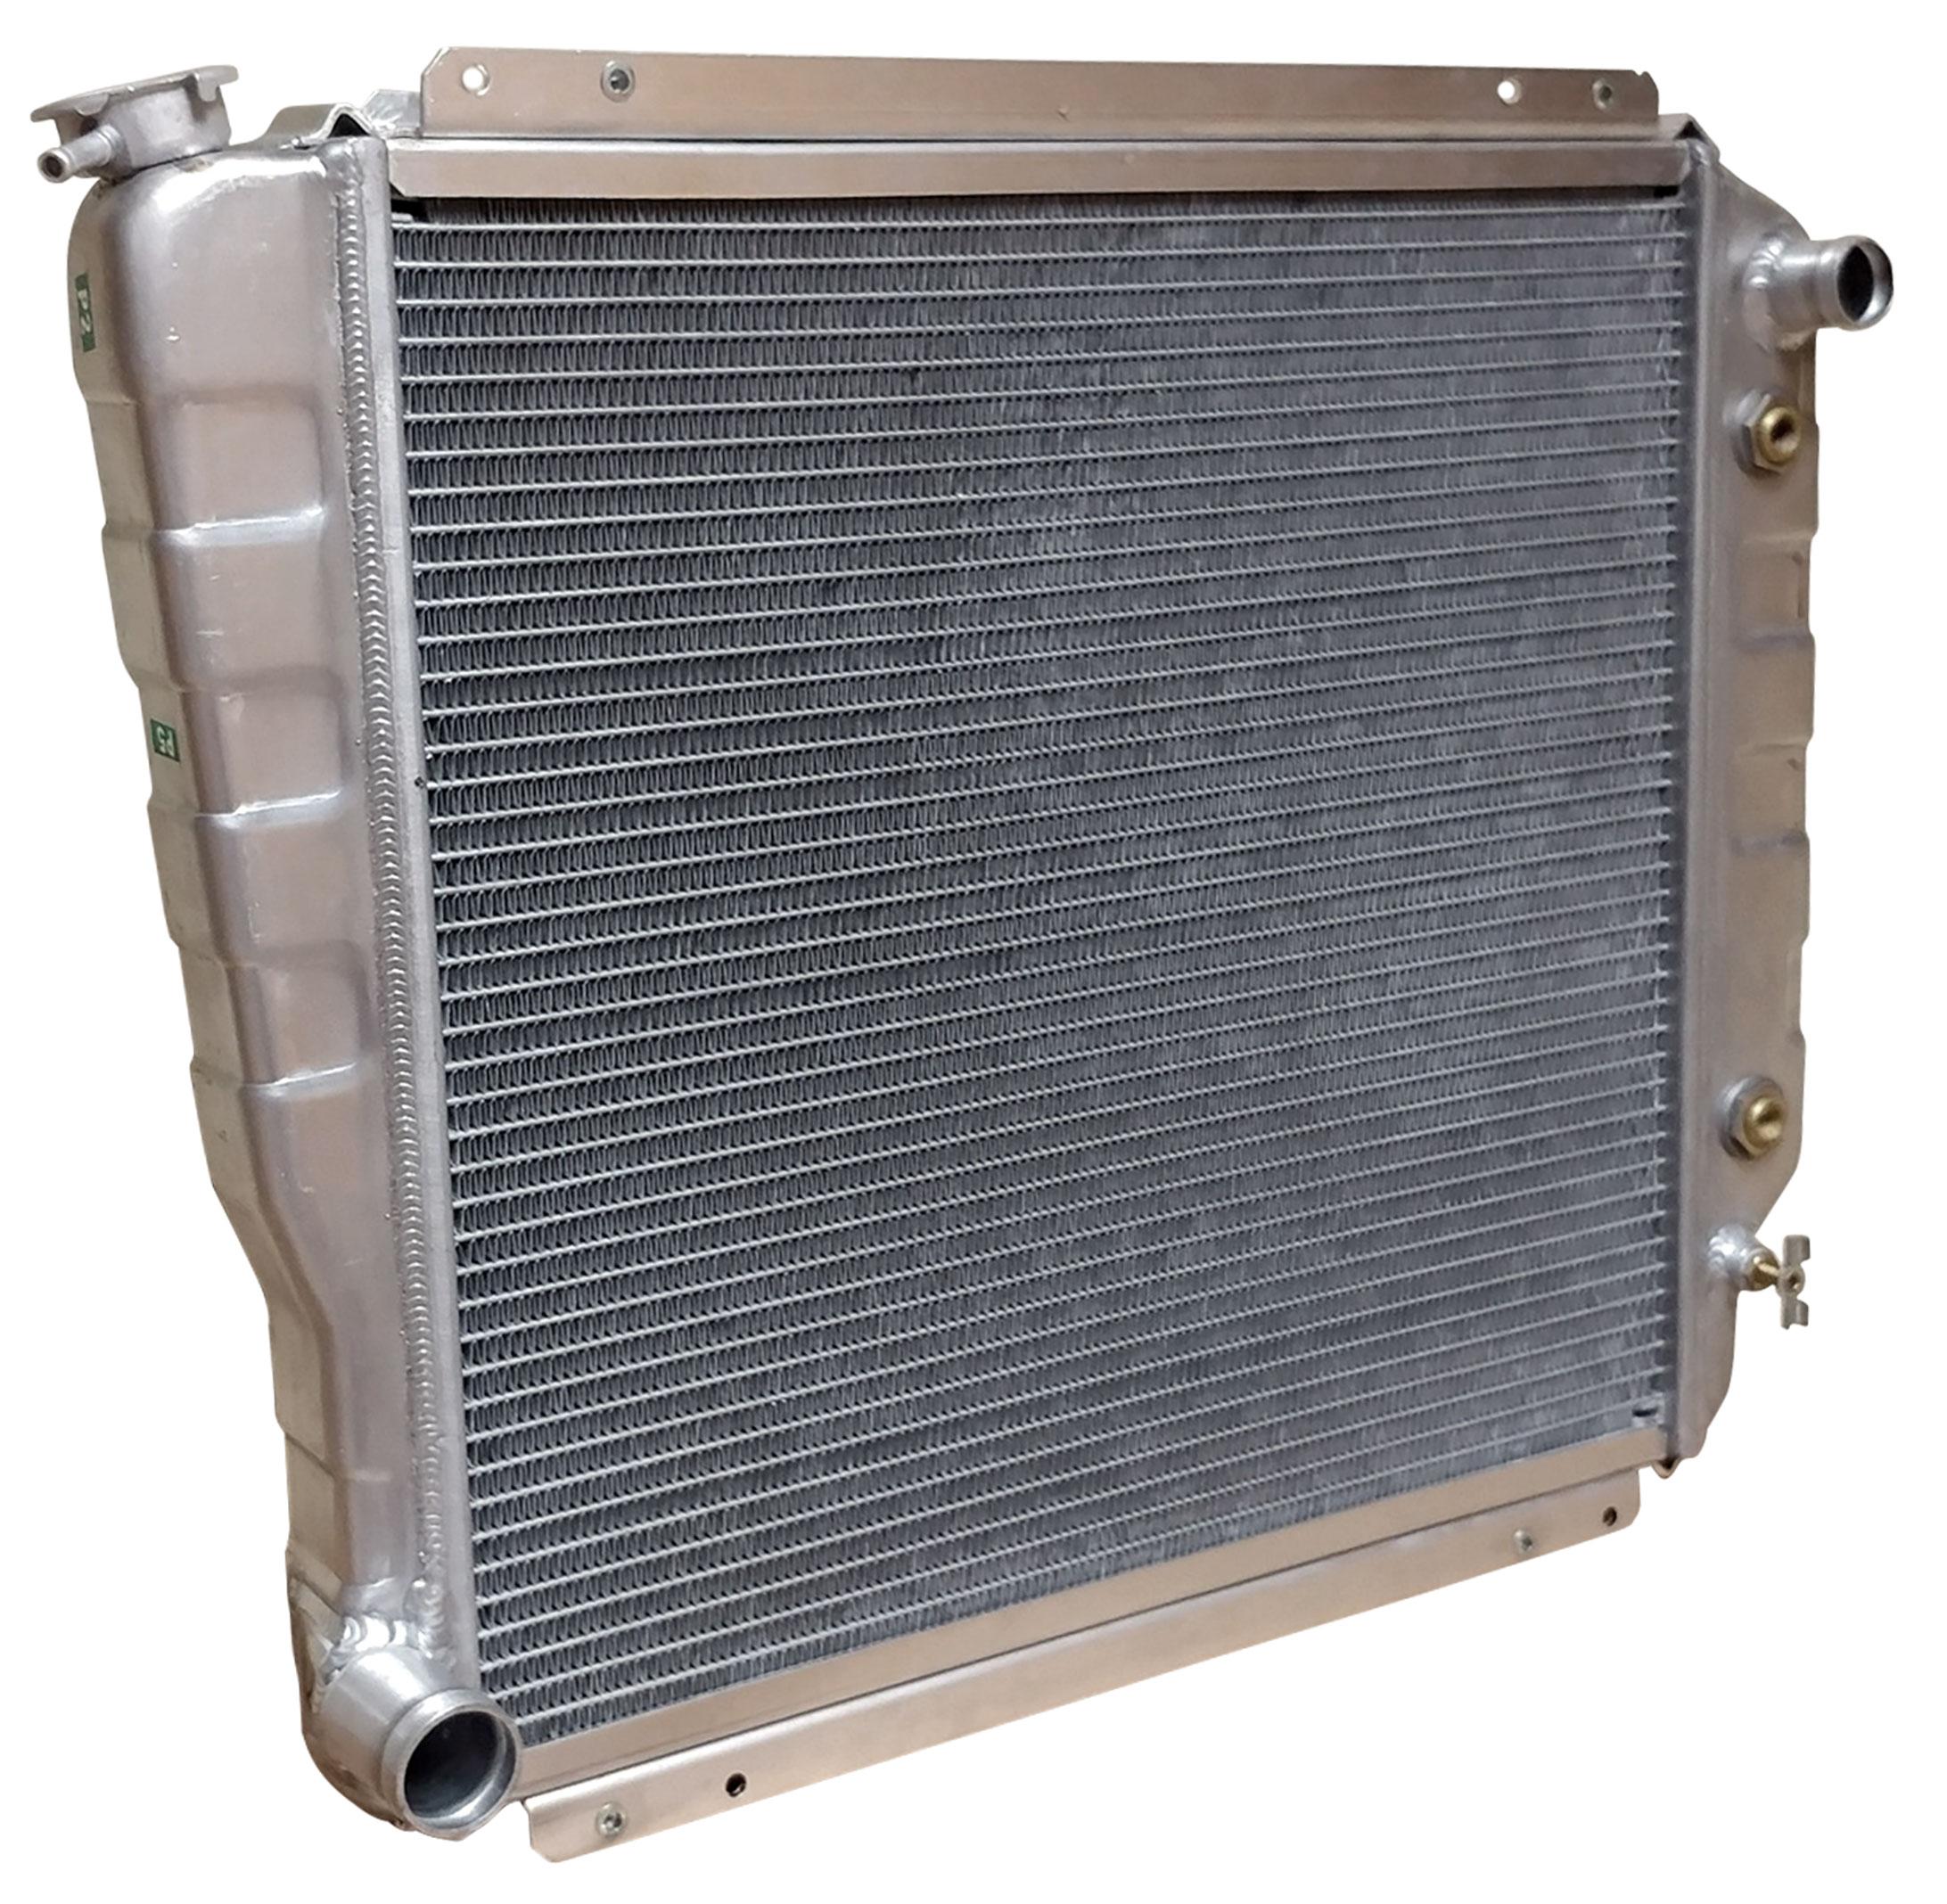 3-Core Aluminum Radiator, Reverse Outlets for Newer EFI Motors